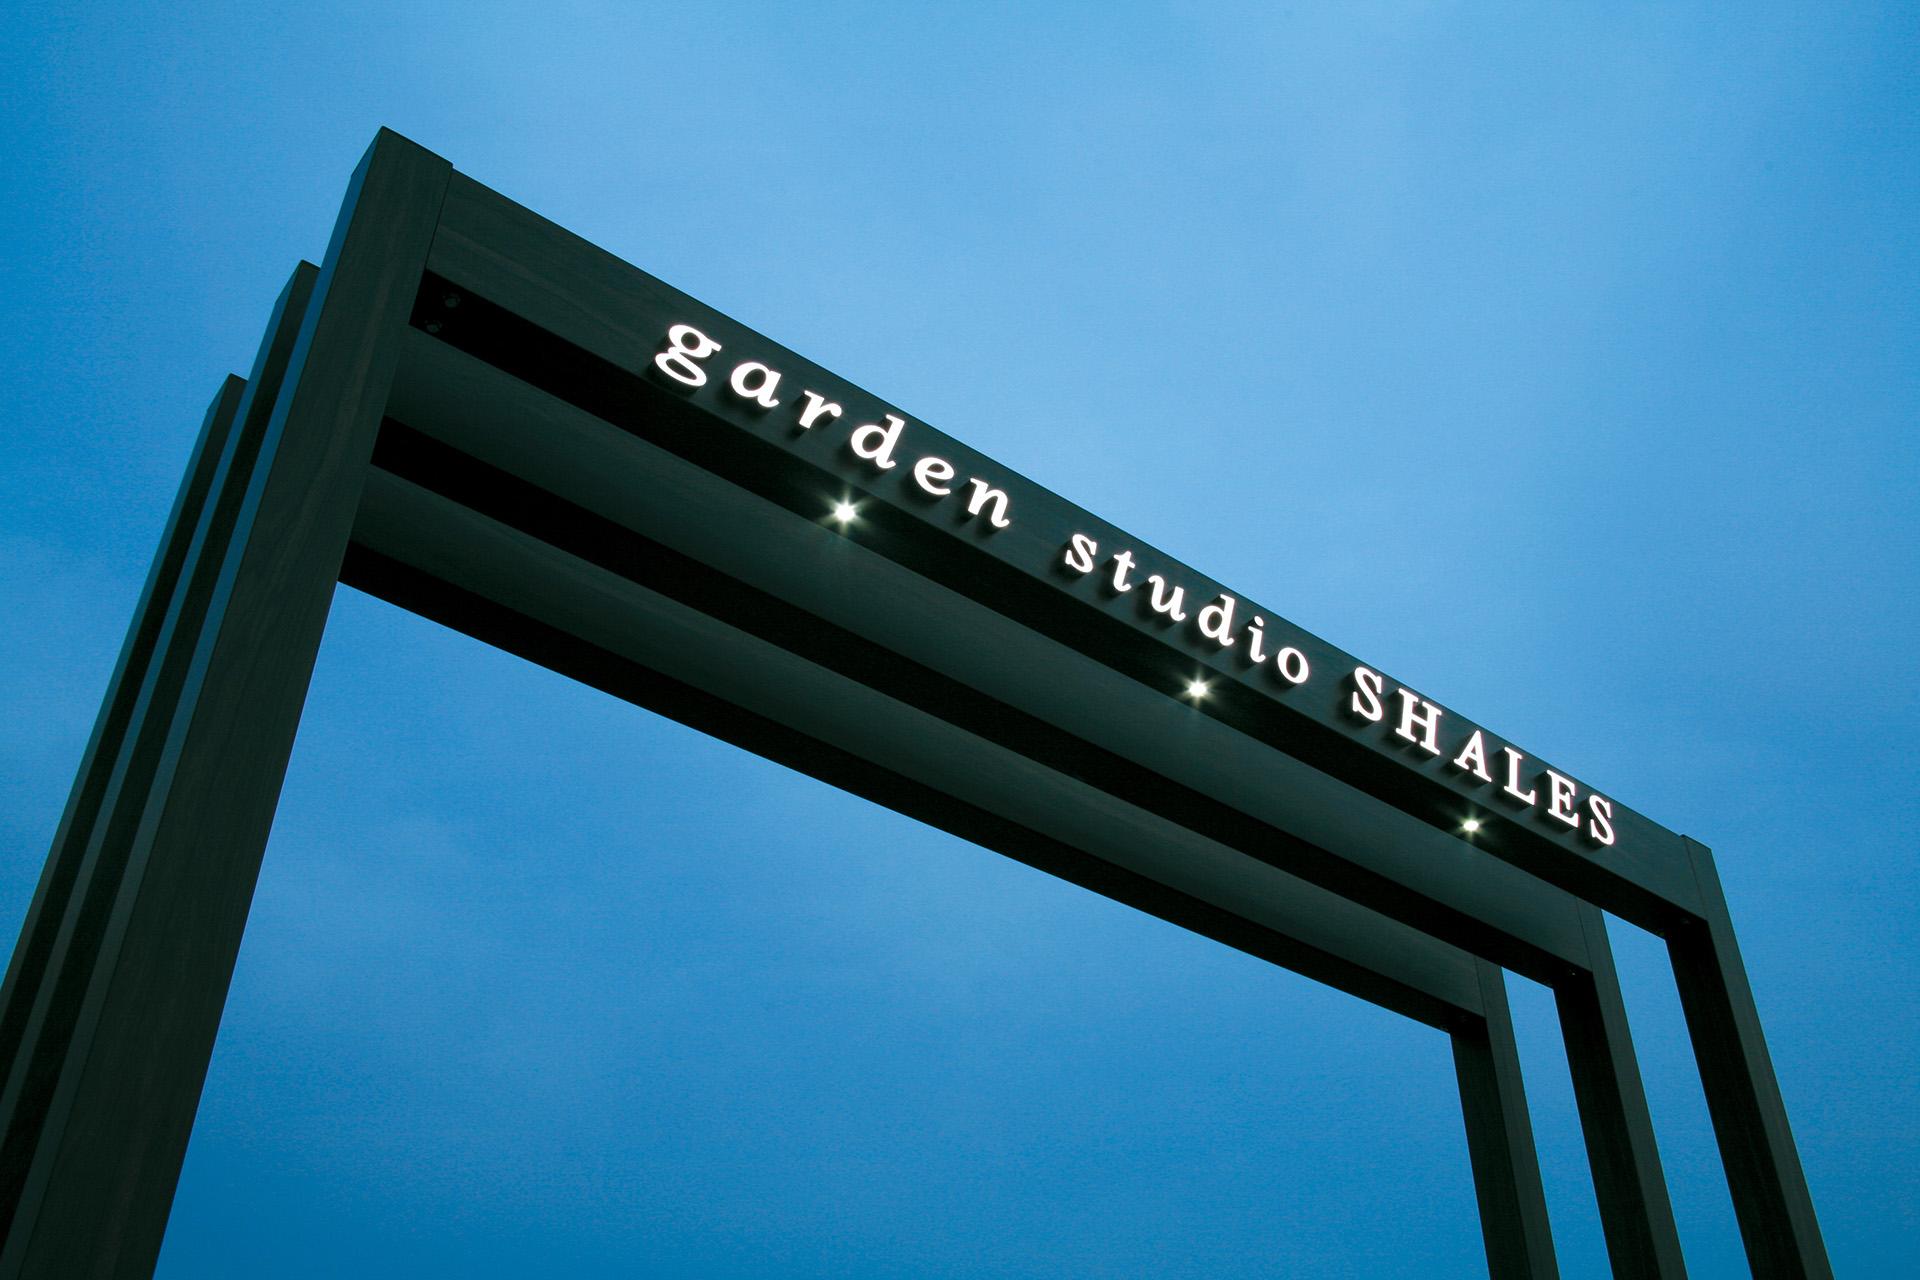 garden studio SHALES